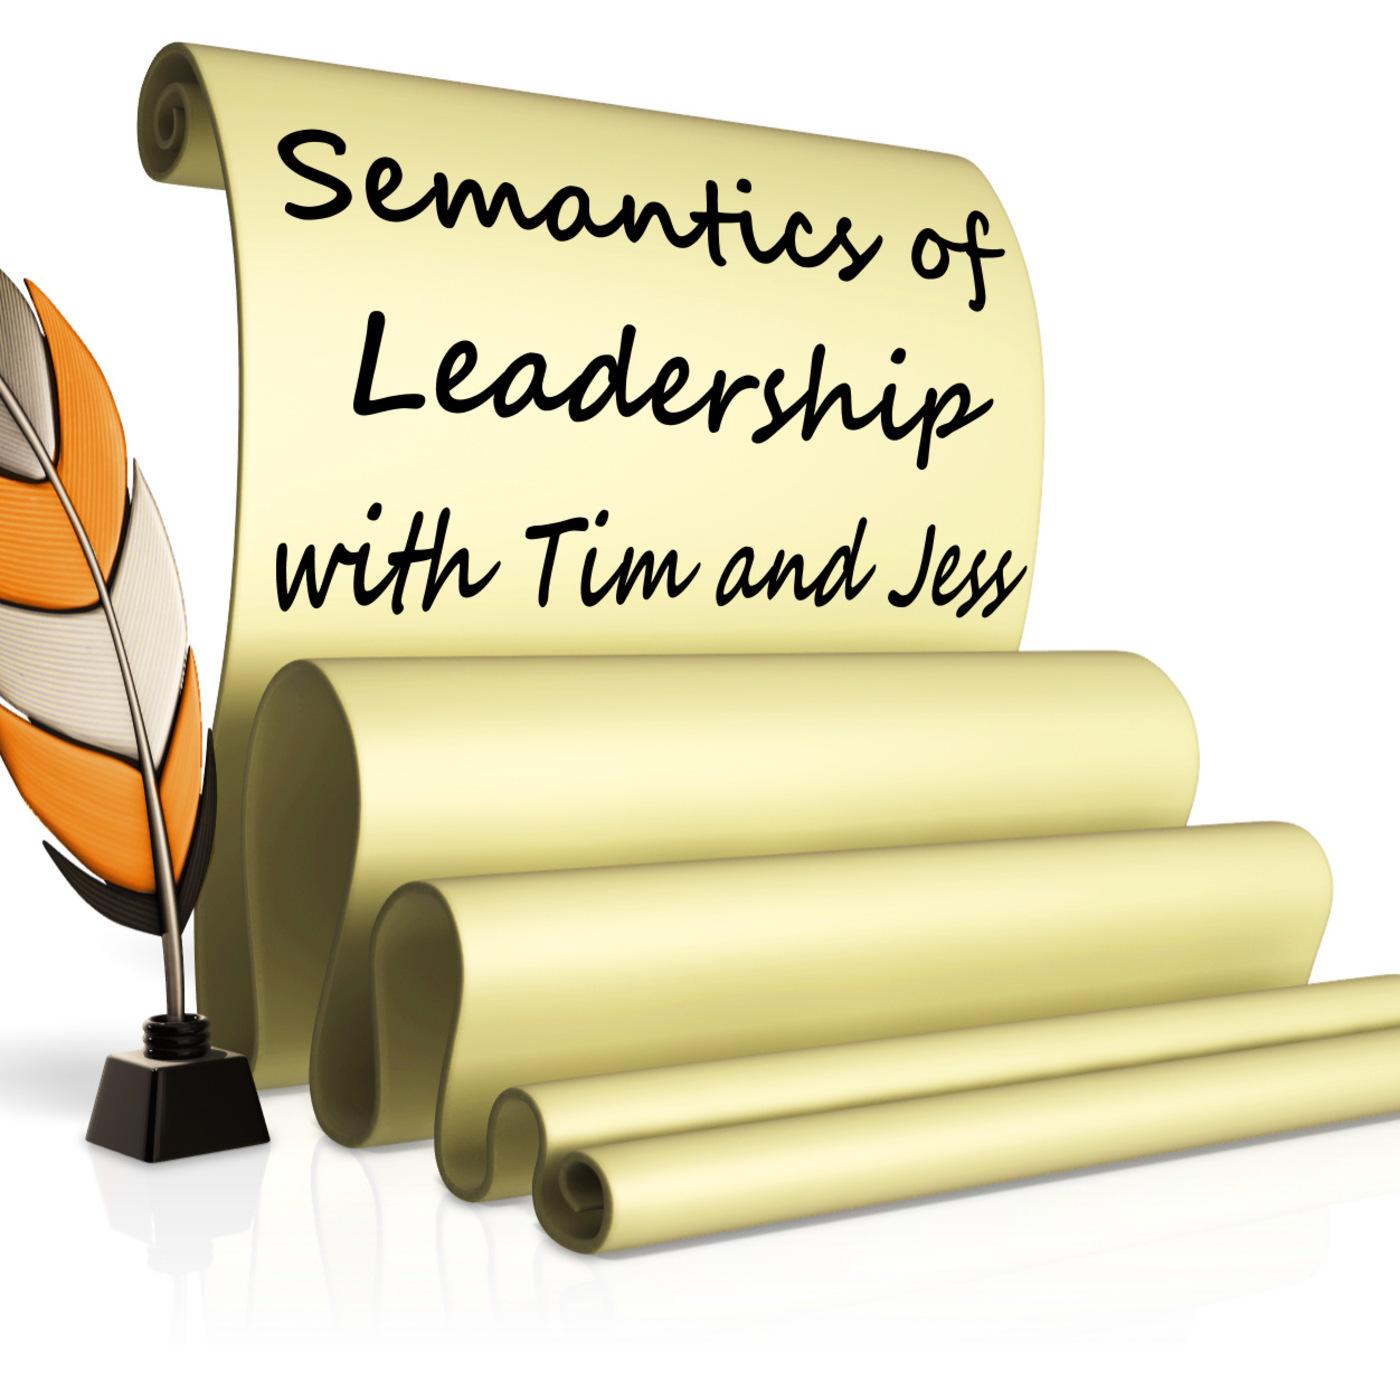 Semantics of Leadership